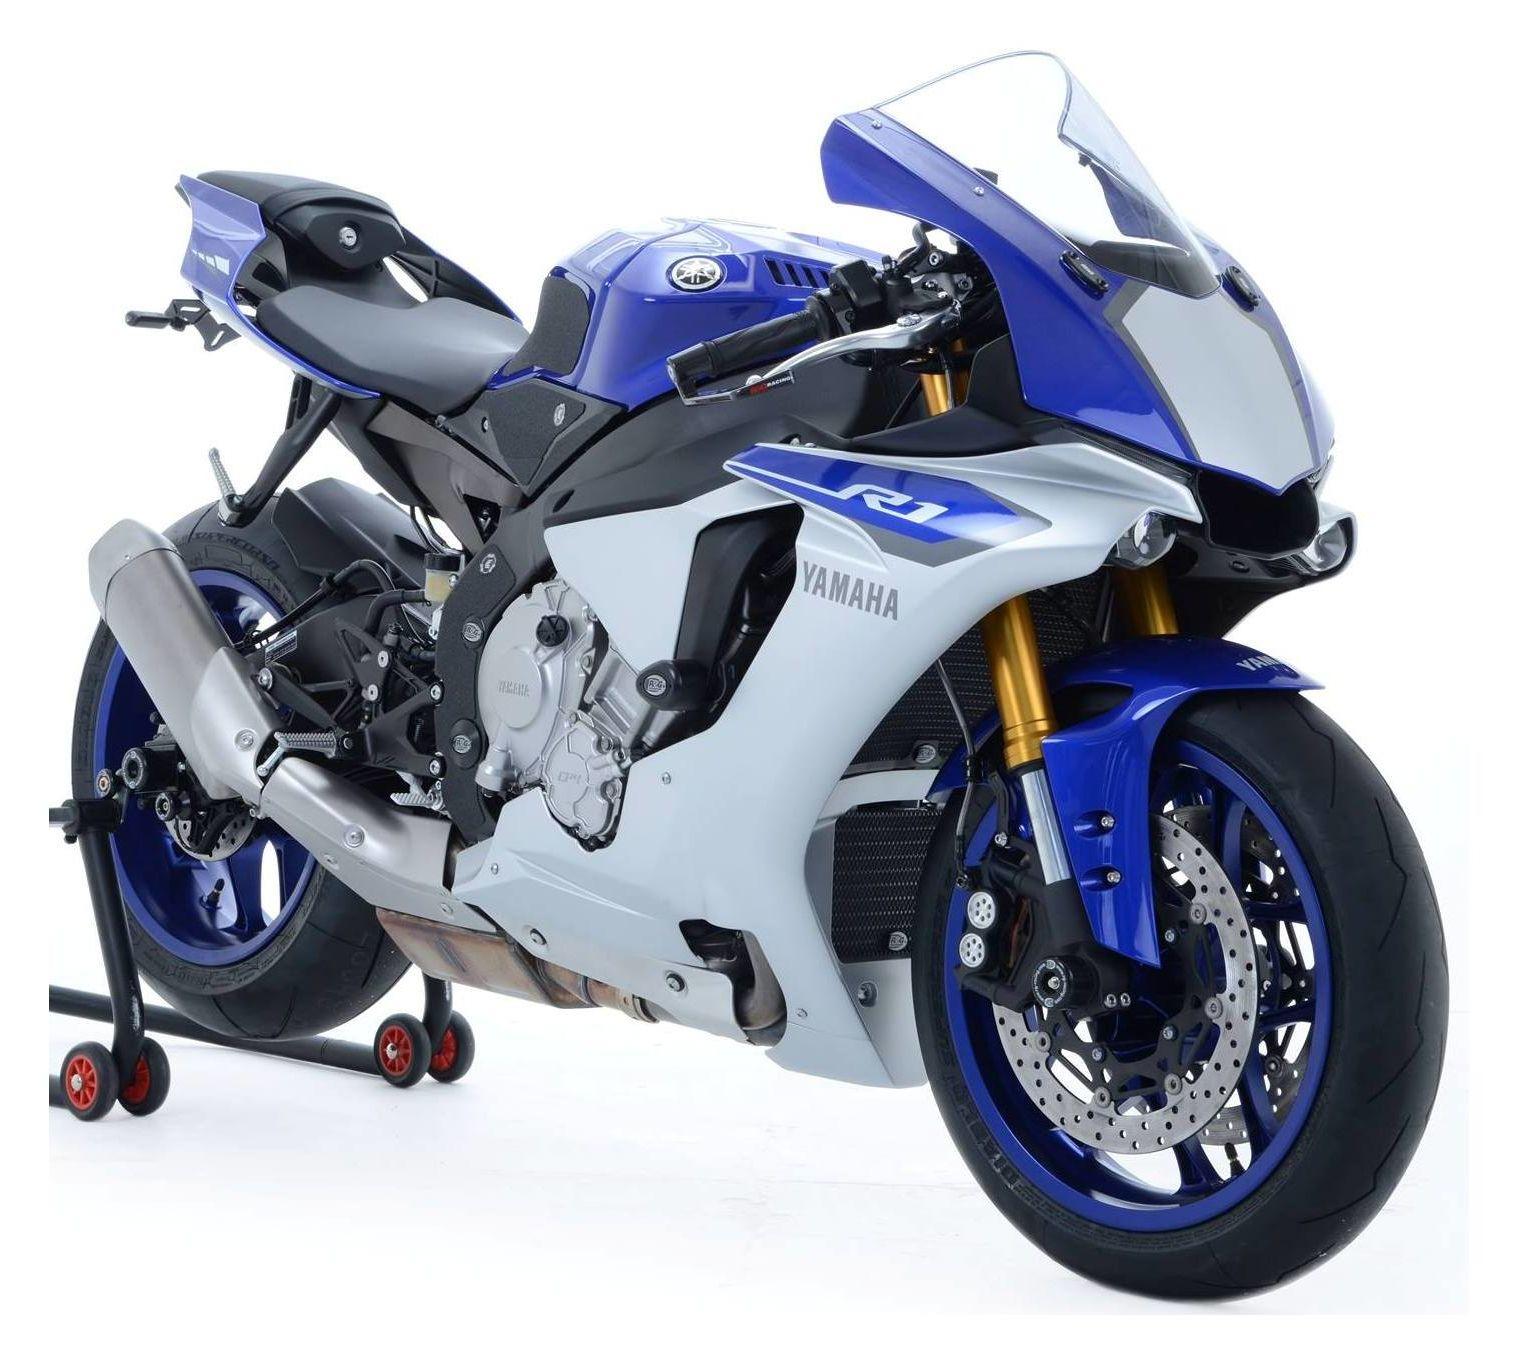 R G Racing Aero Frame Sliders Yamaha R1 R1m 2015 2019